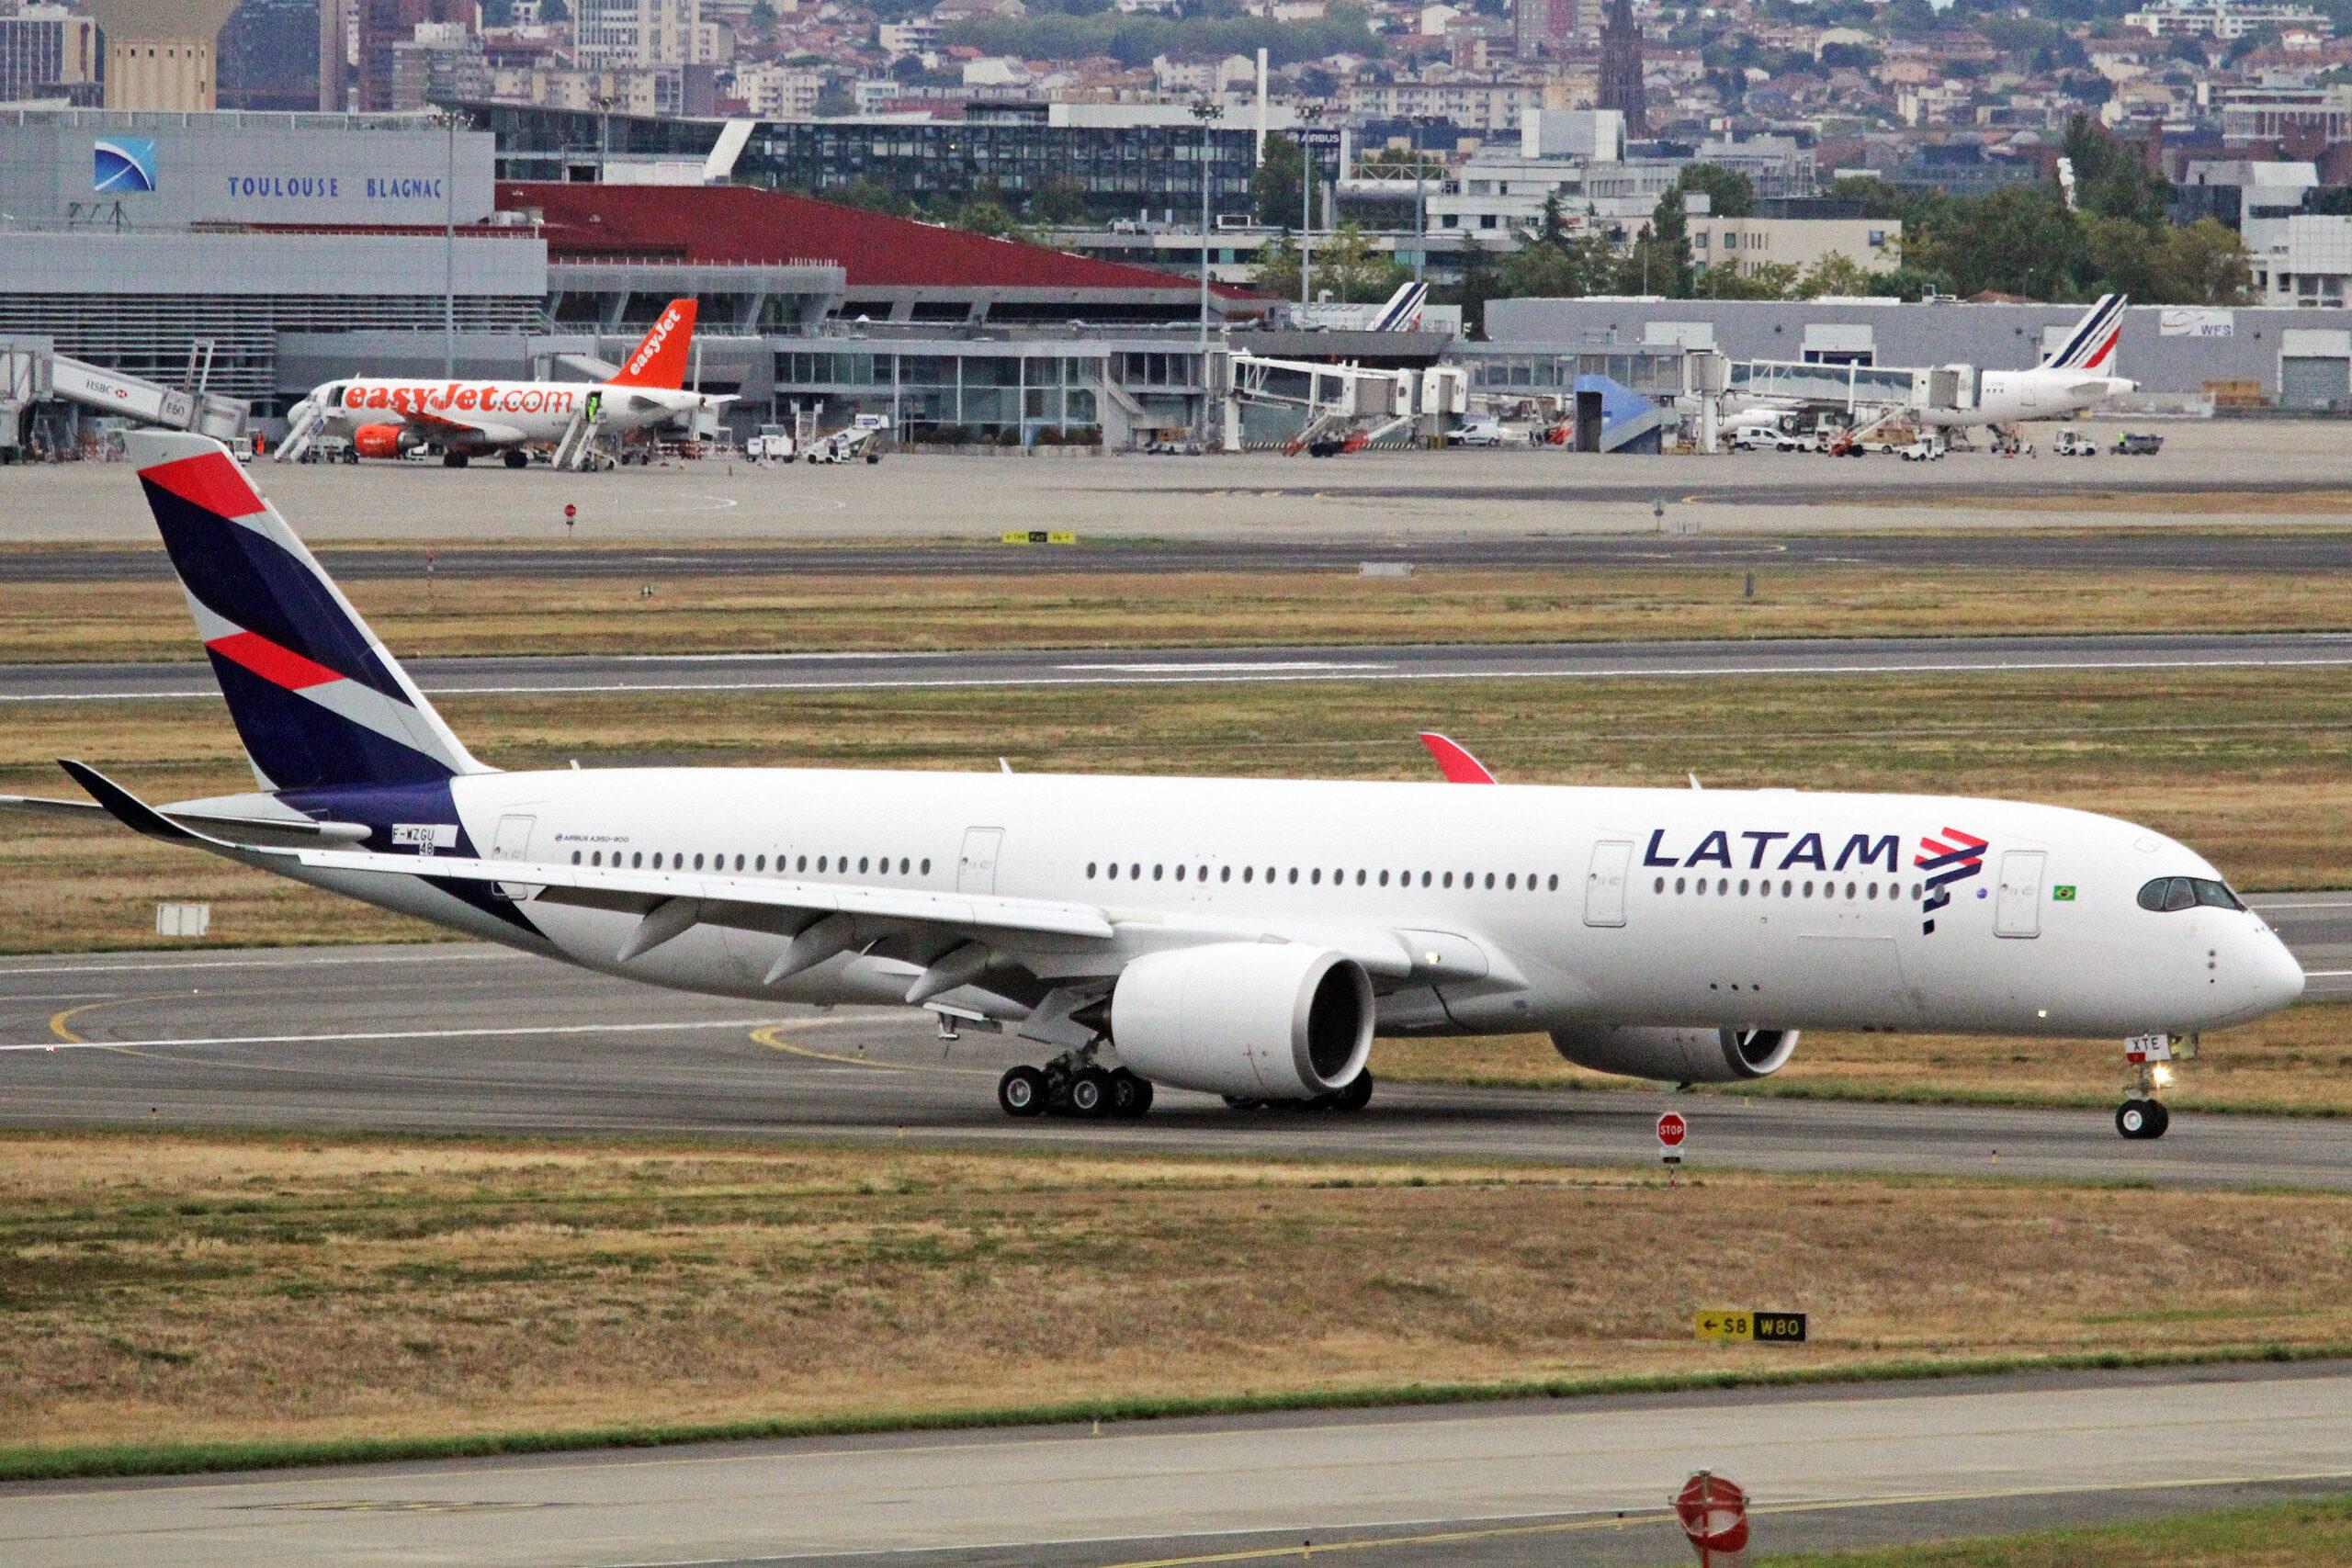 F-WZGU_(PR-XTE_048)_Airbus_A350-941_Airbus_Industrie_(LATAM_Airlines_Brazil)_TLS_16SEP16